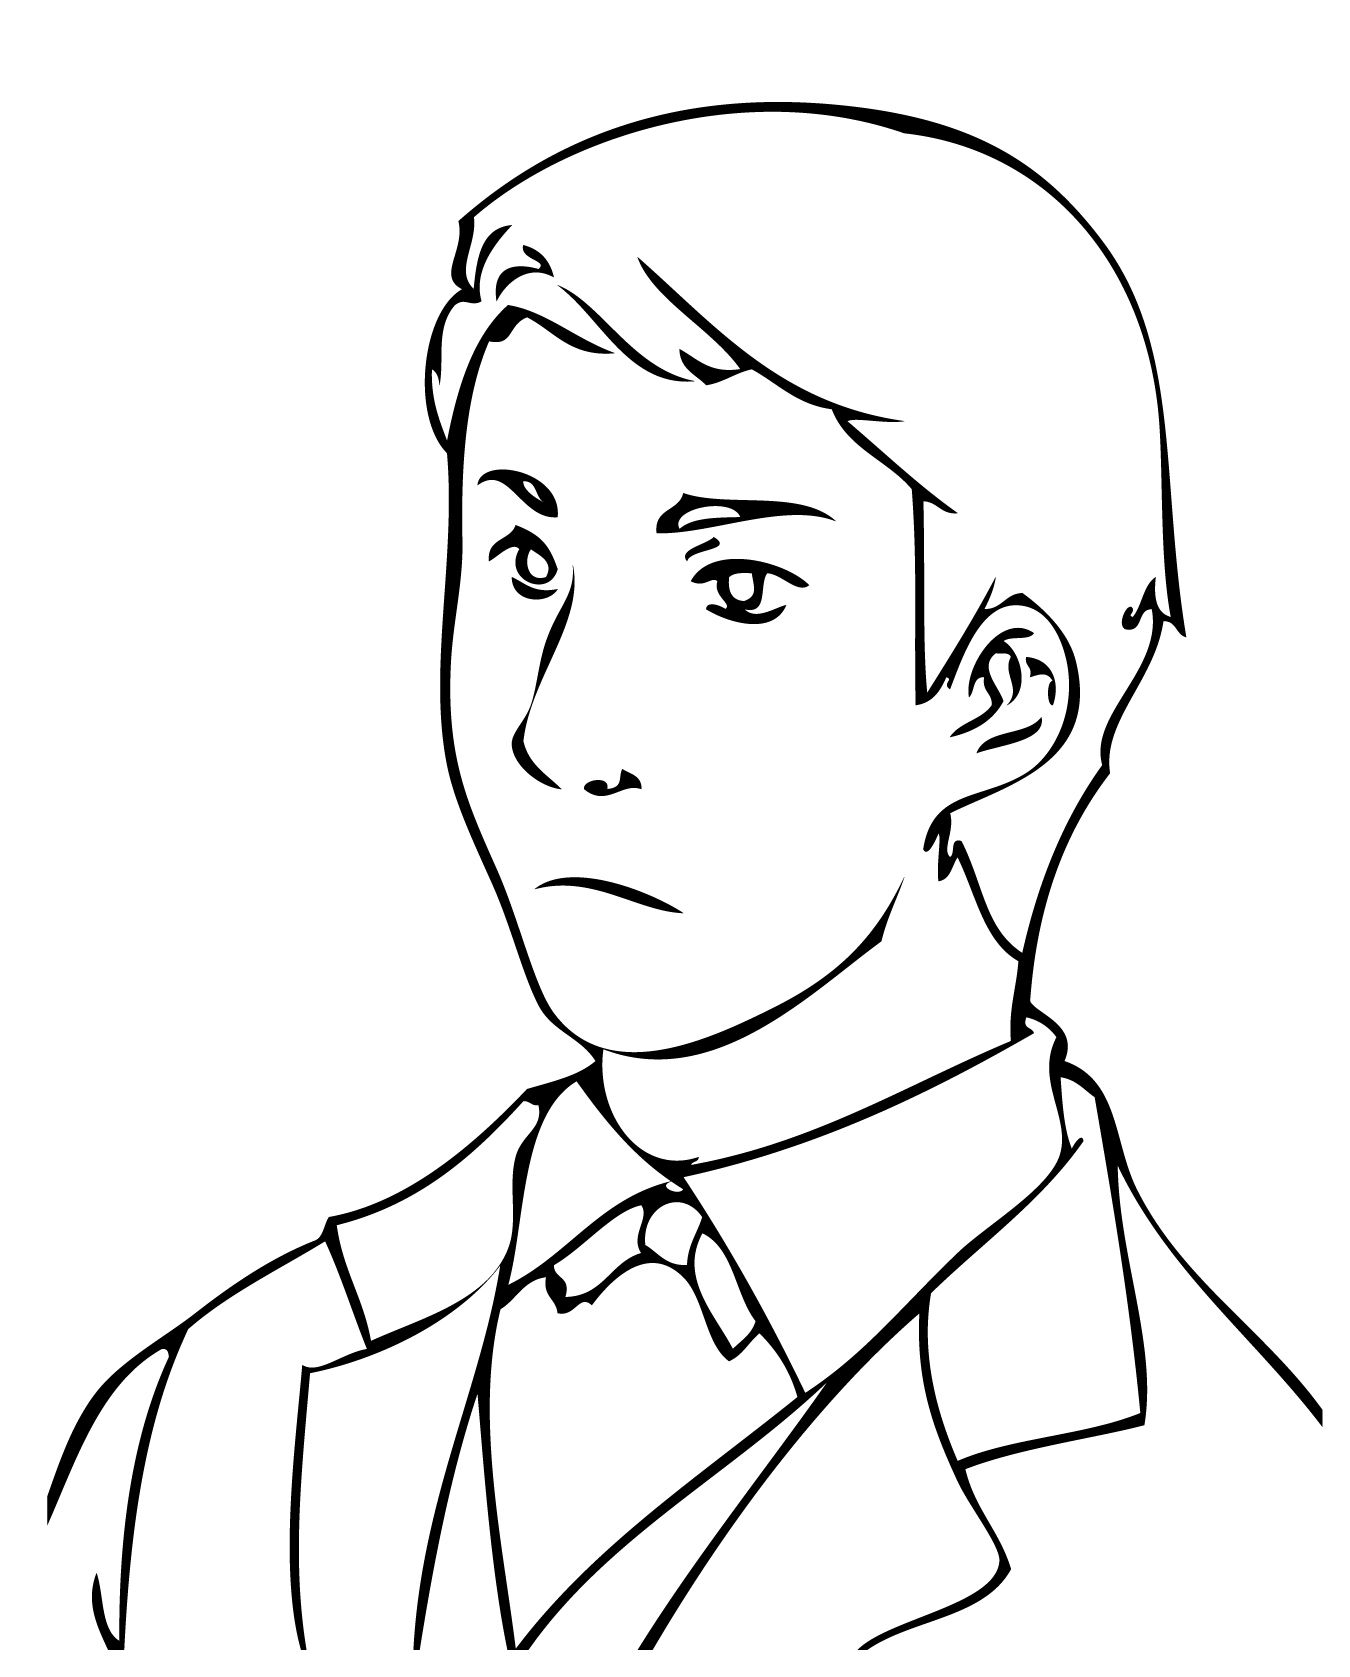 Thomas Edison As Young Man Coloring Page